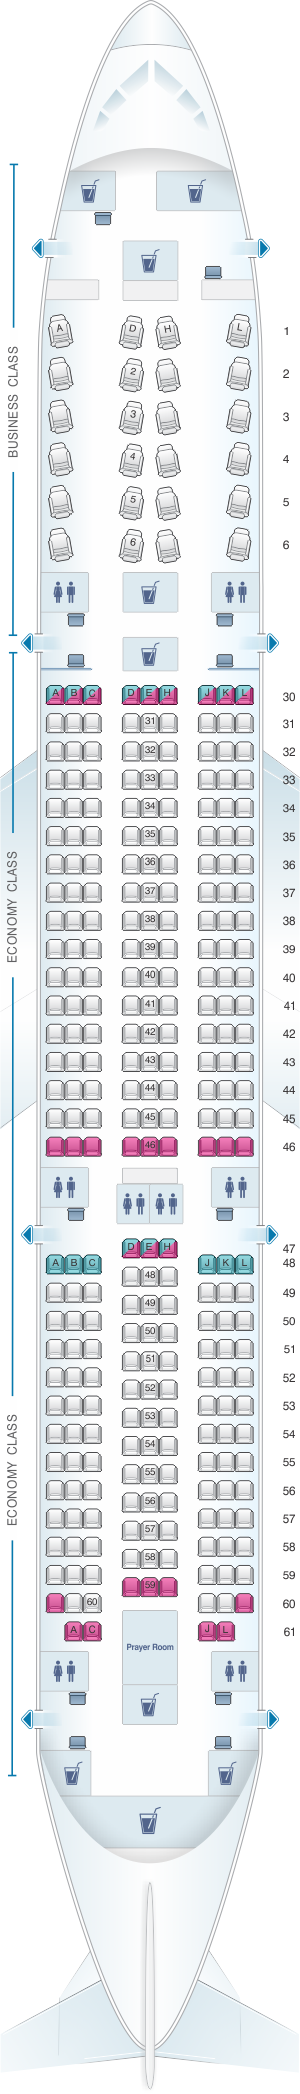 Seat map for Saudi Arabian Airlines Boeing B787-9